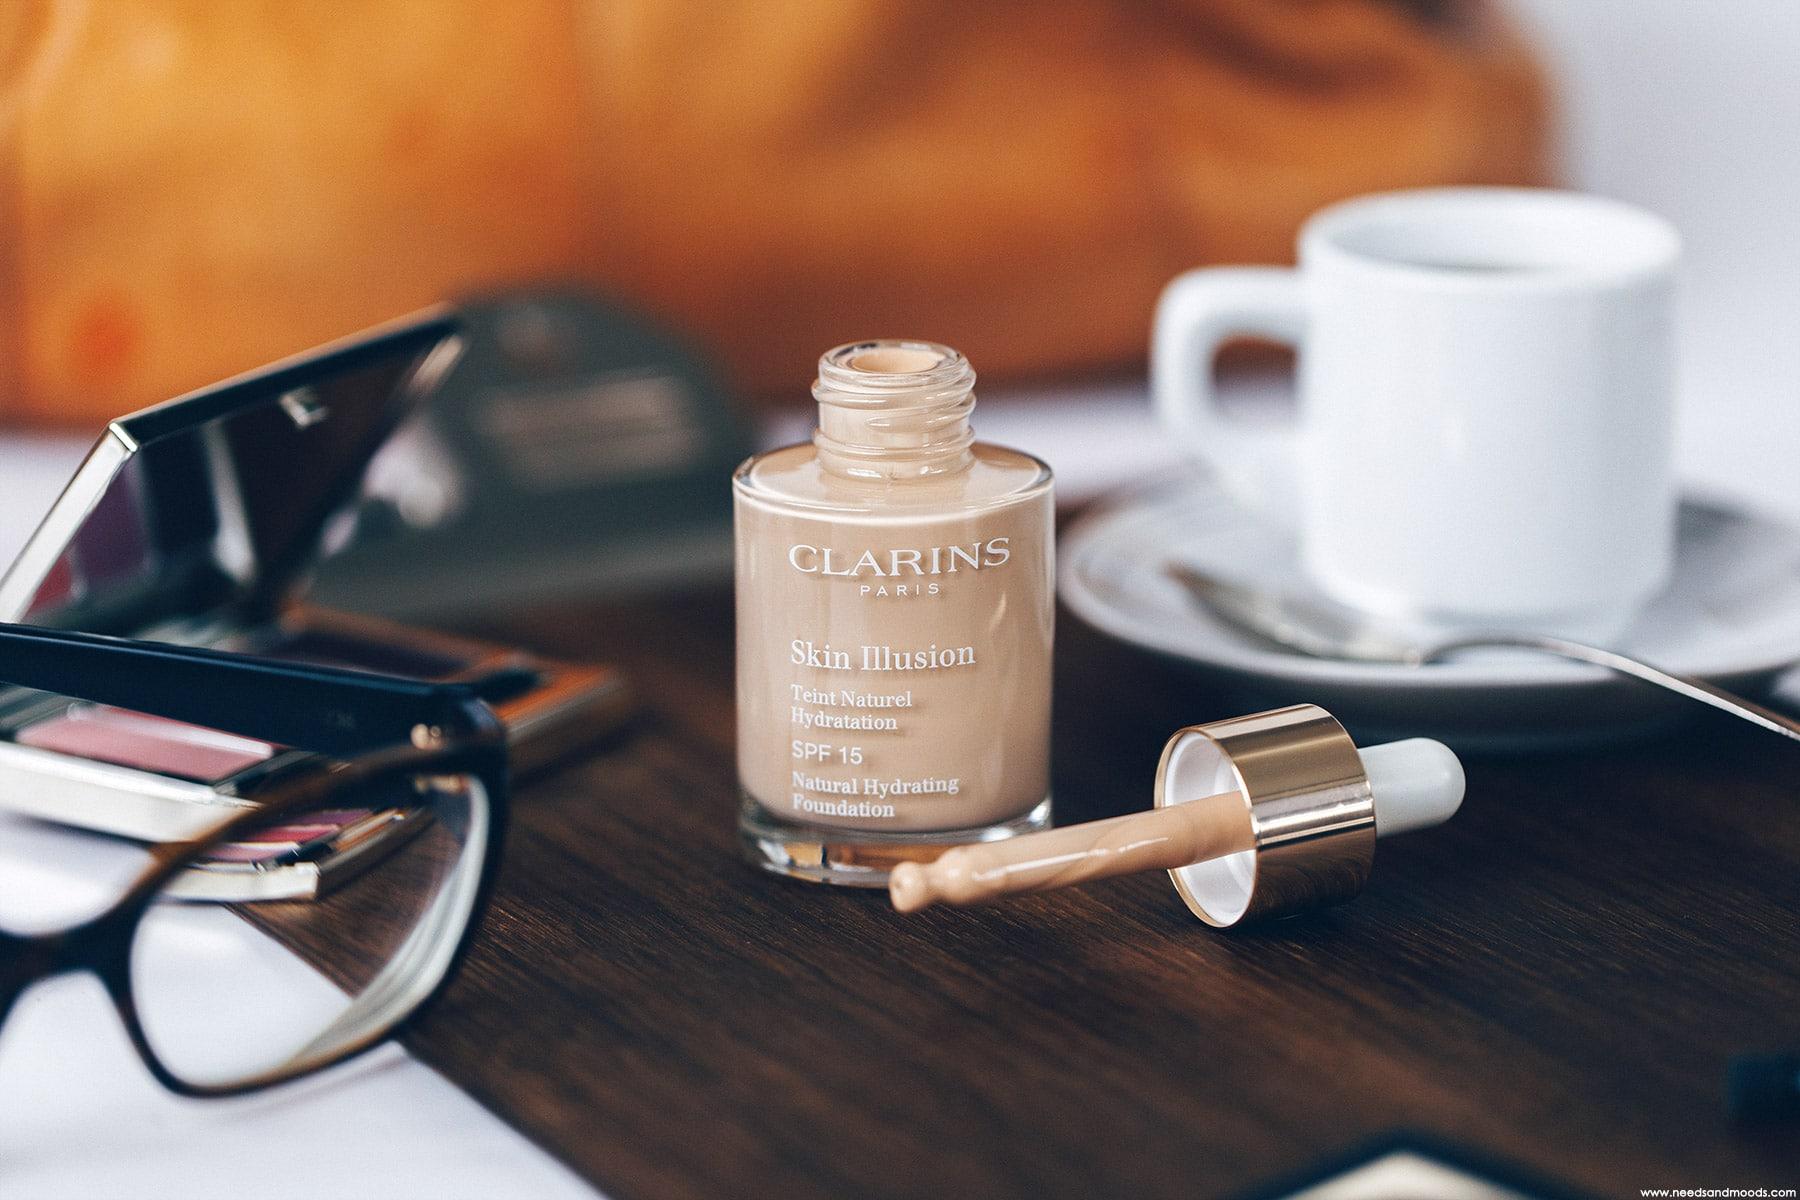 skin illusion clarins